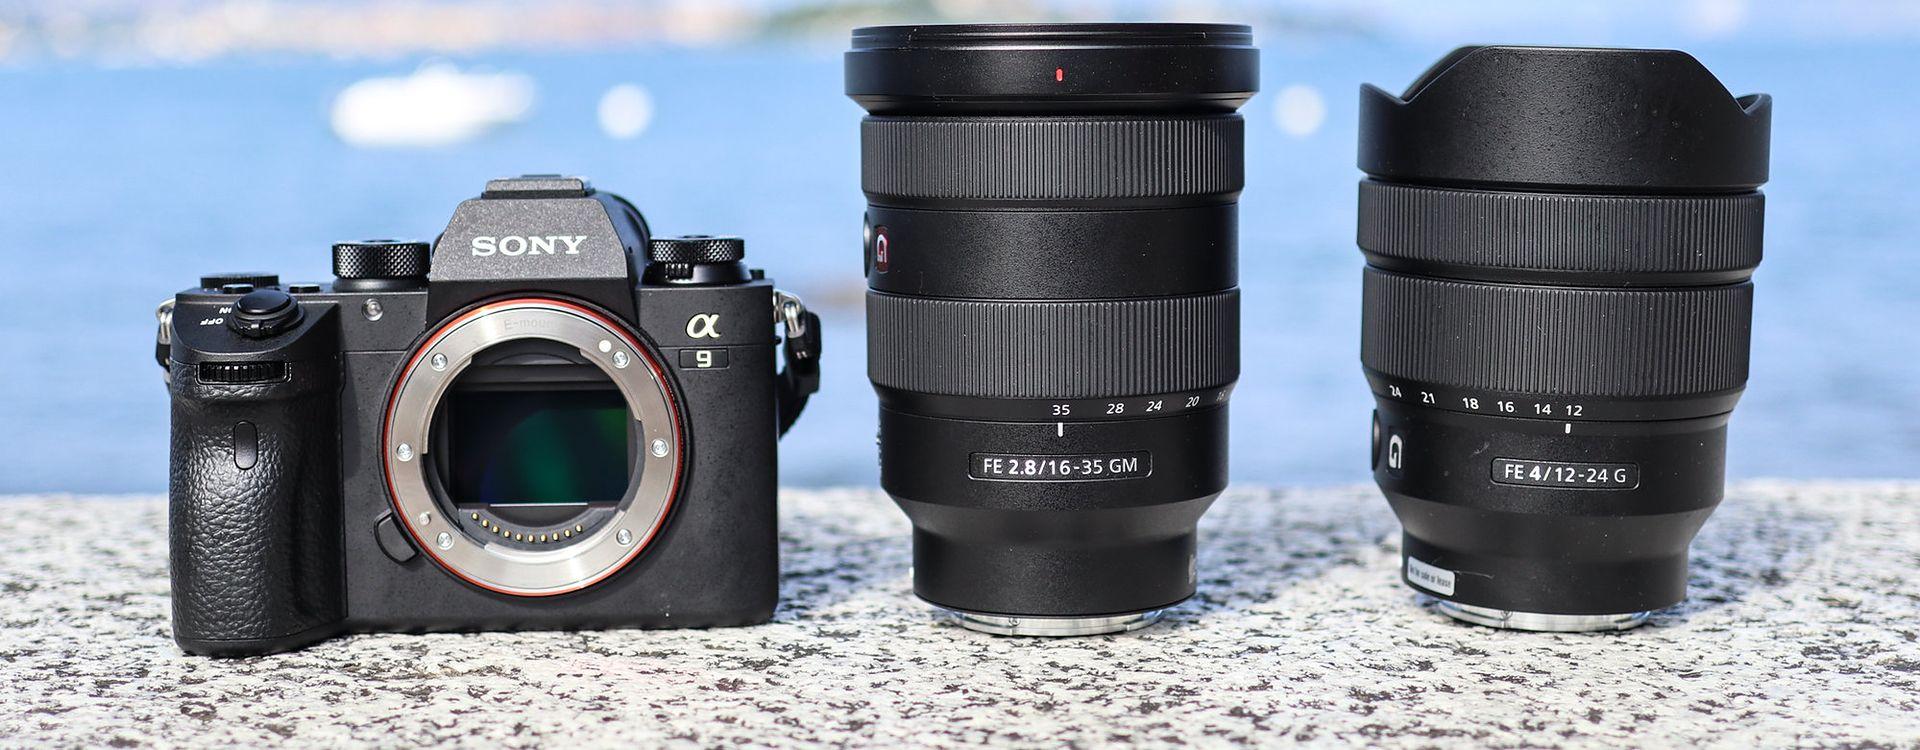 Sony A9 / Sony FE 16-35 mm f/2.8 GM / Sony FE 12-24 mm f/4 G